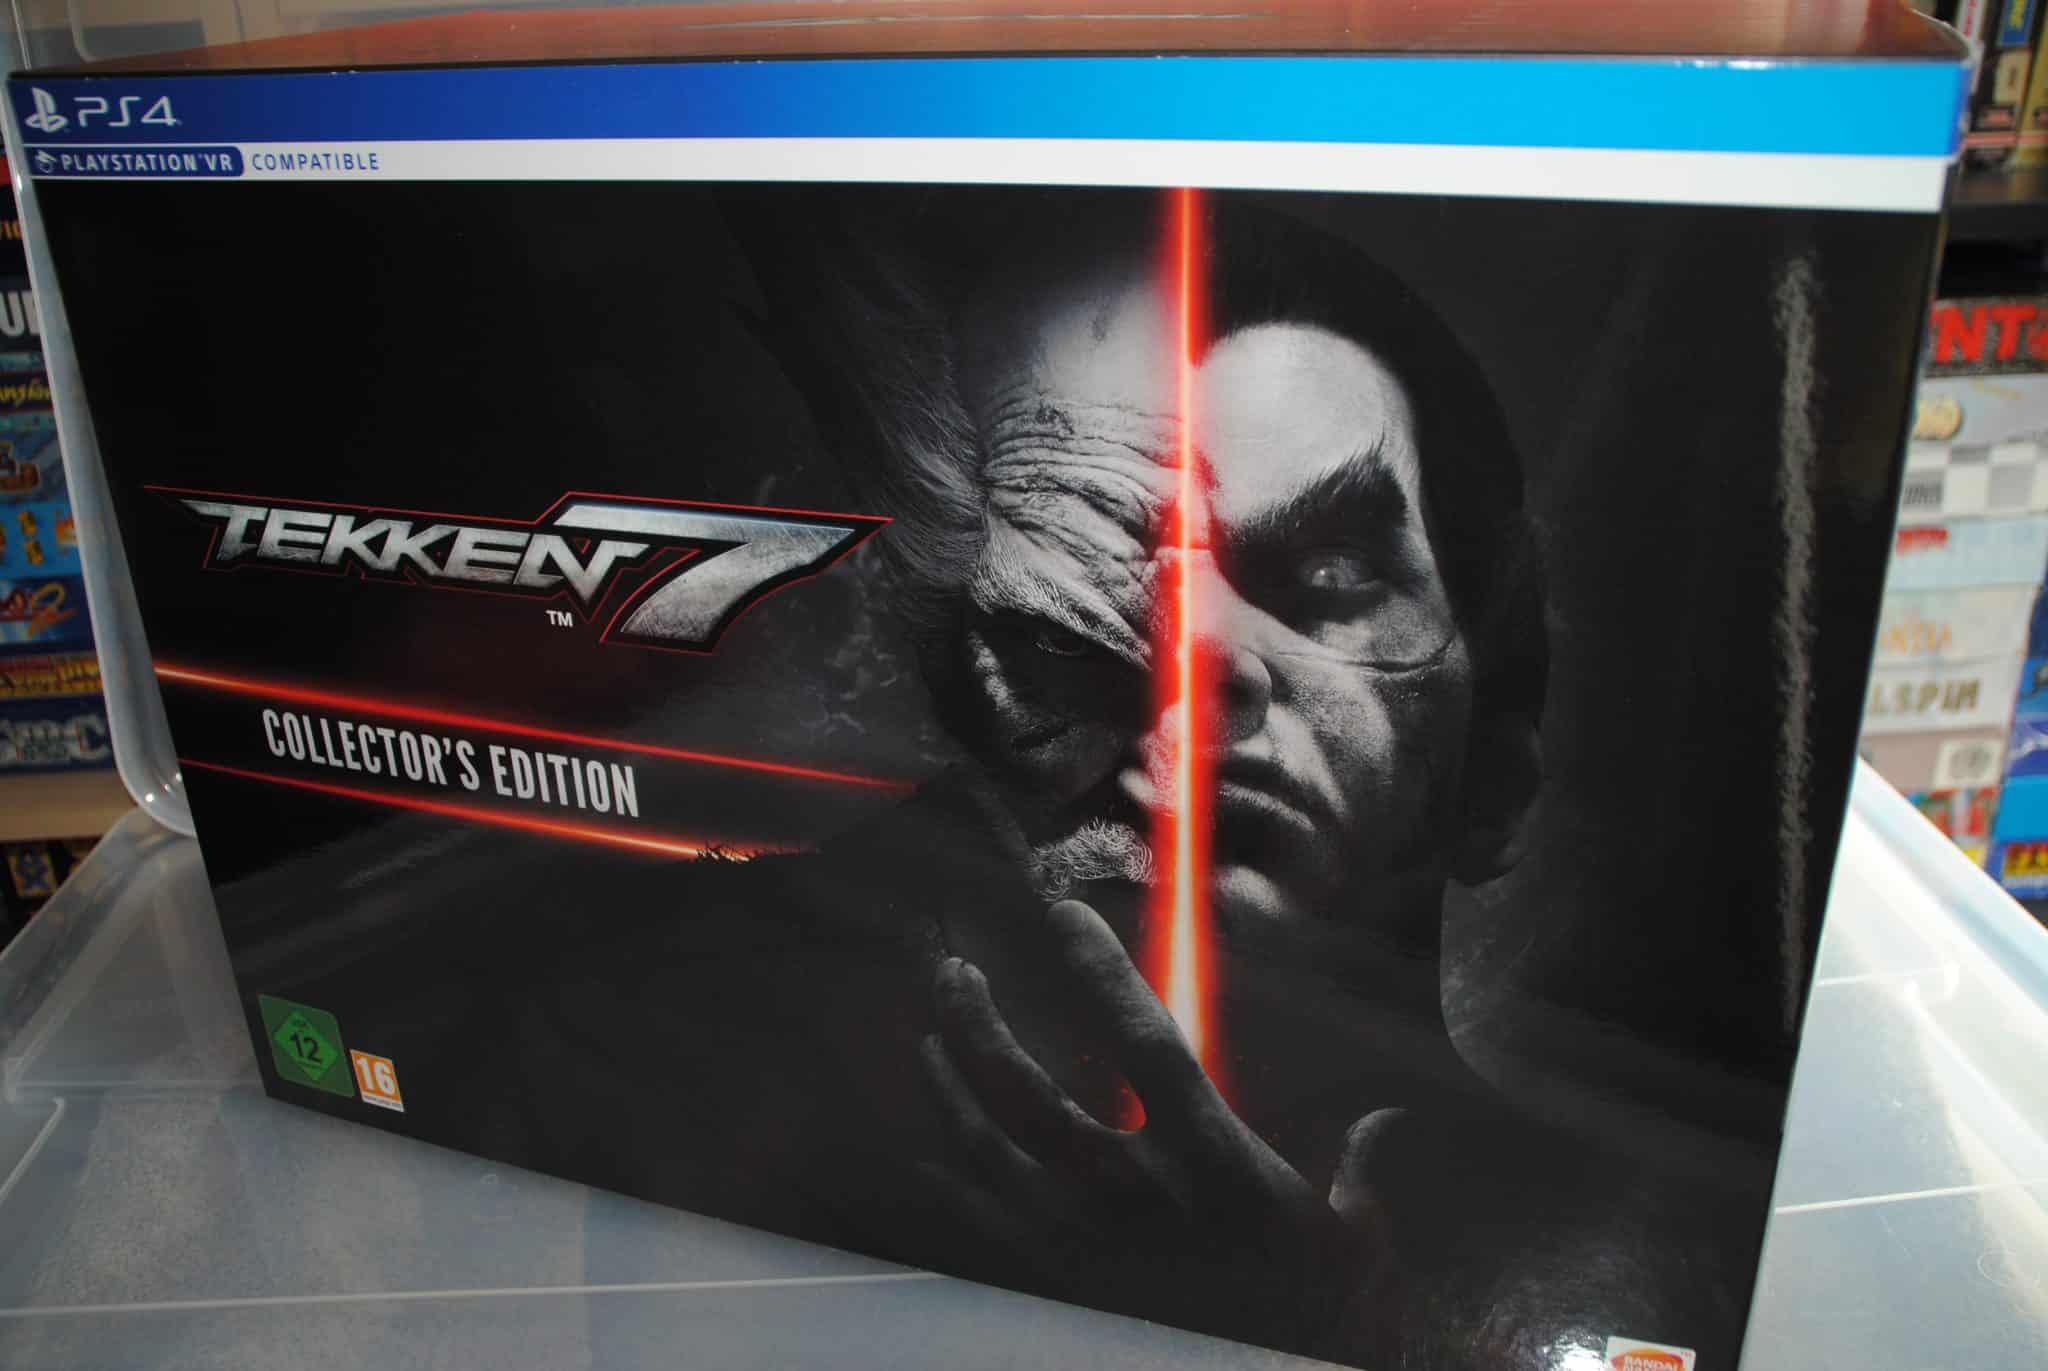 2f6c4baa1 A Look At Tekken 7 Collector s Edition